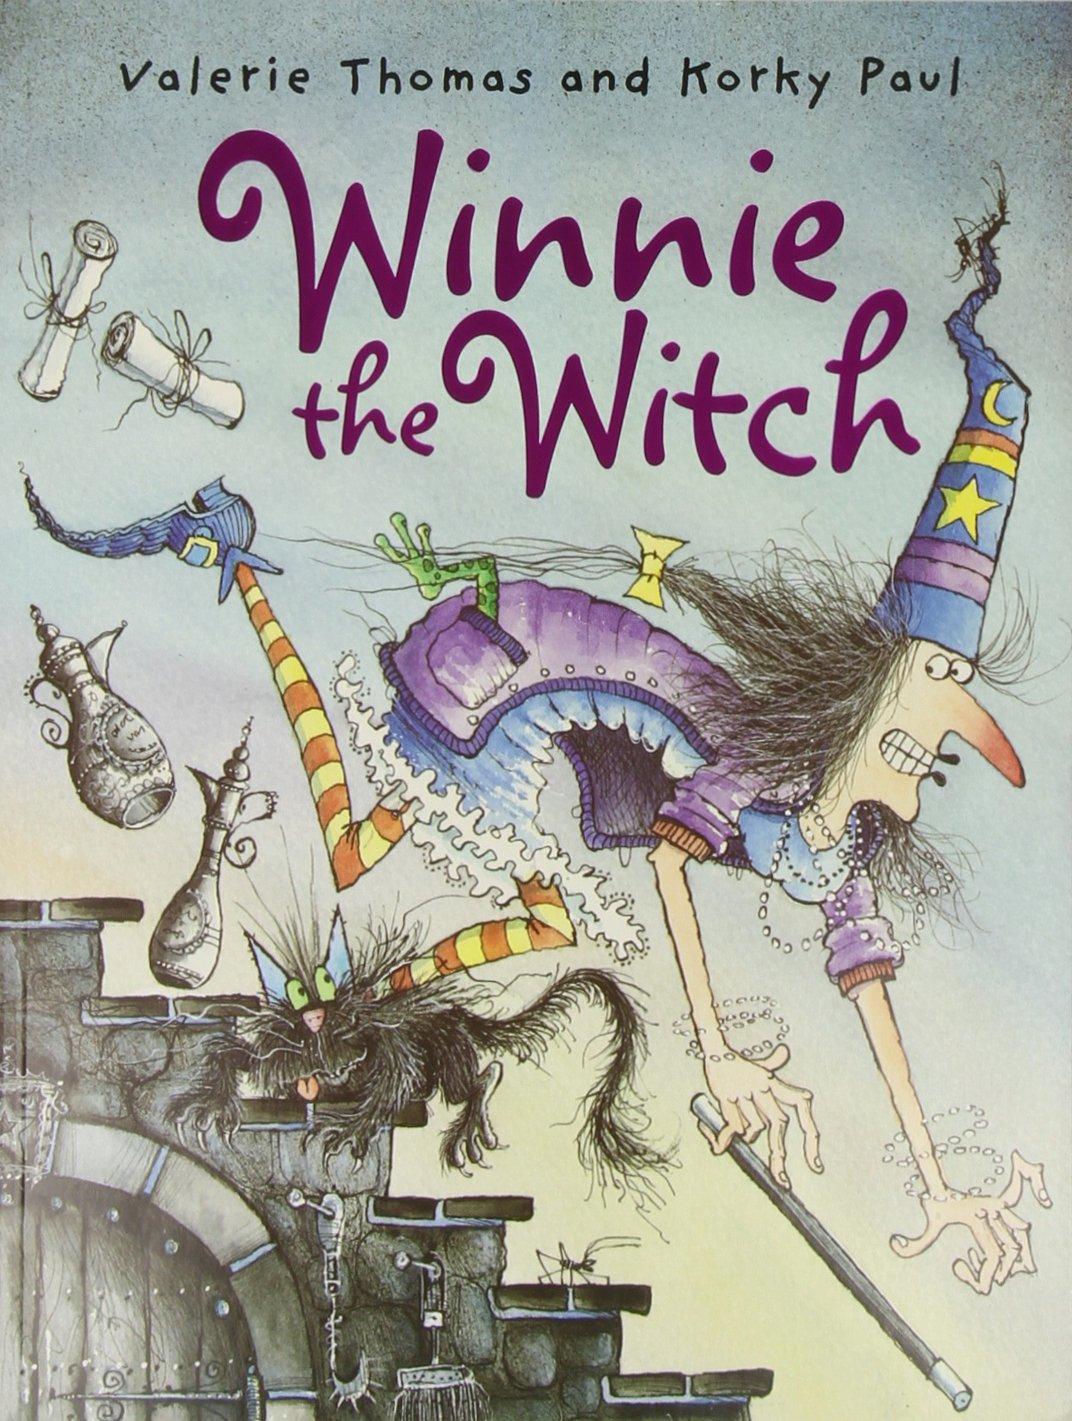 Winnie the Witch: Amazon.co.uk: Thomas, Valerie, Paul, Korky: 9780192726438: Books